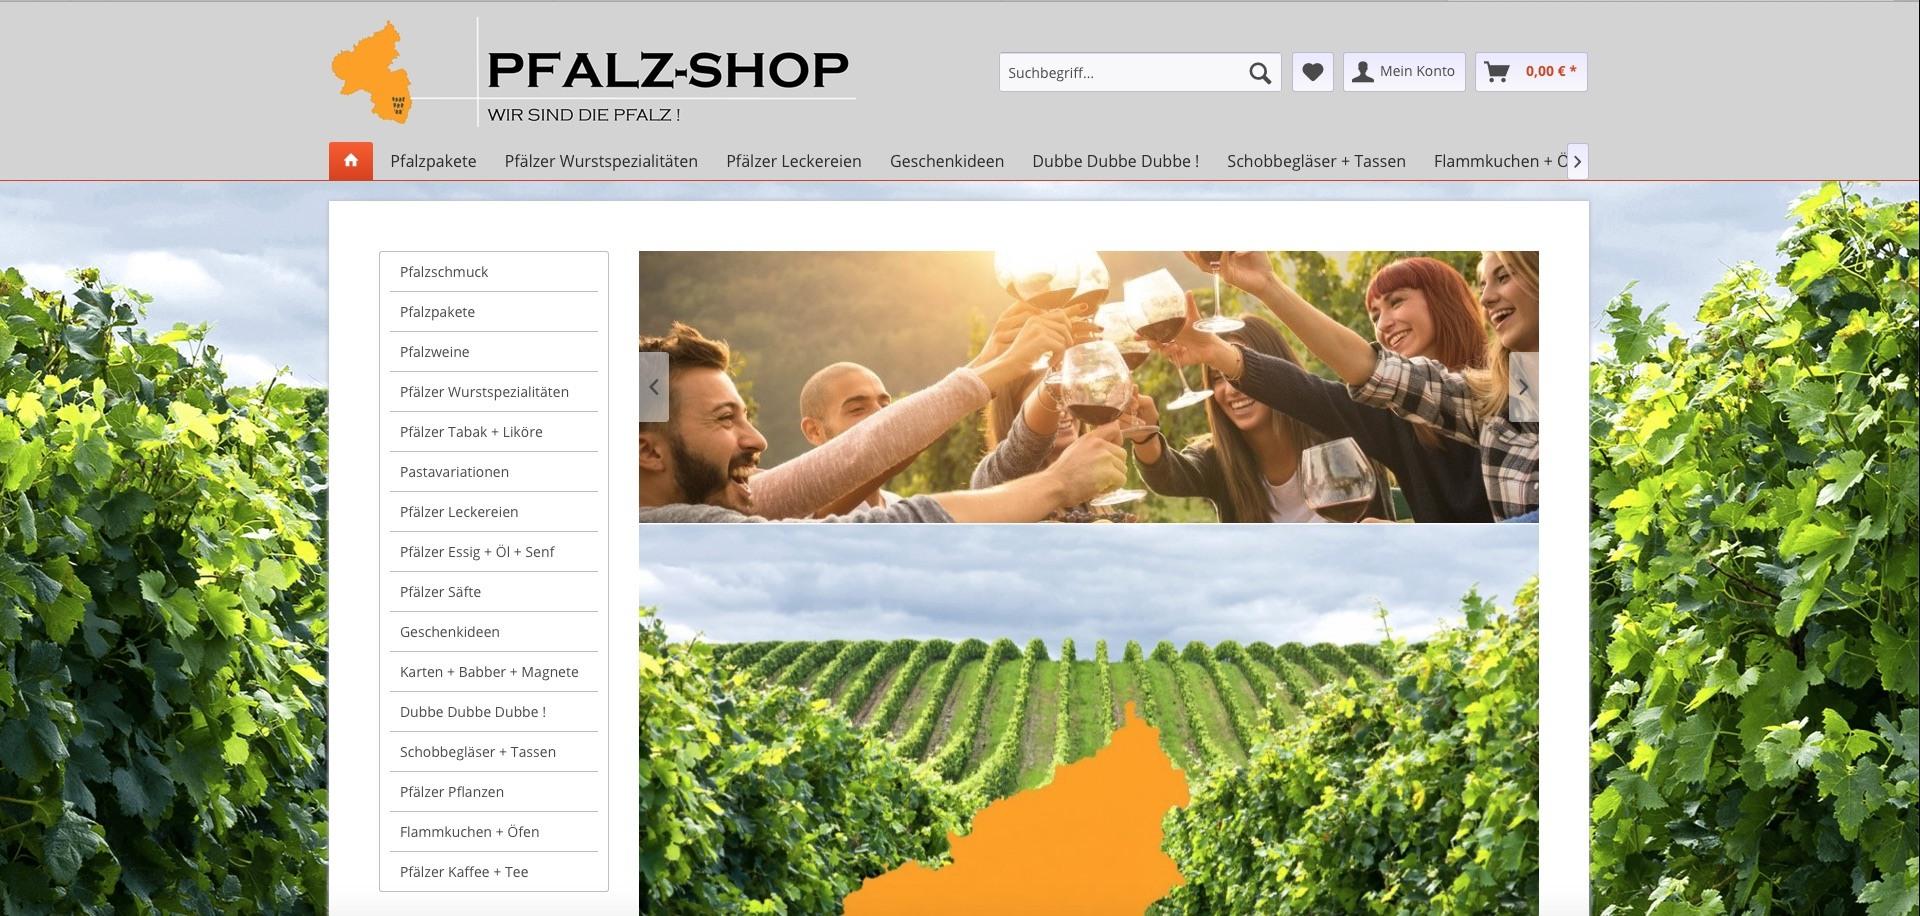 Bildschirmfoto von Pfalz-shop.de